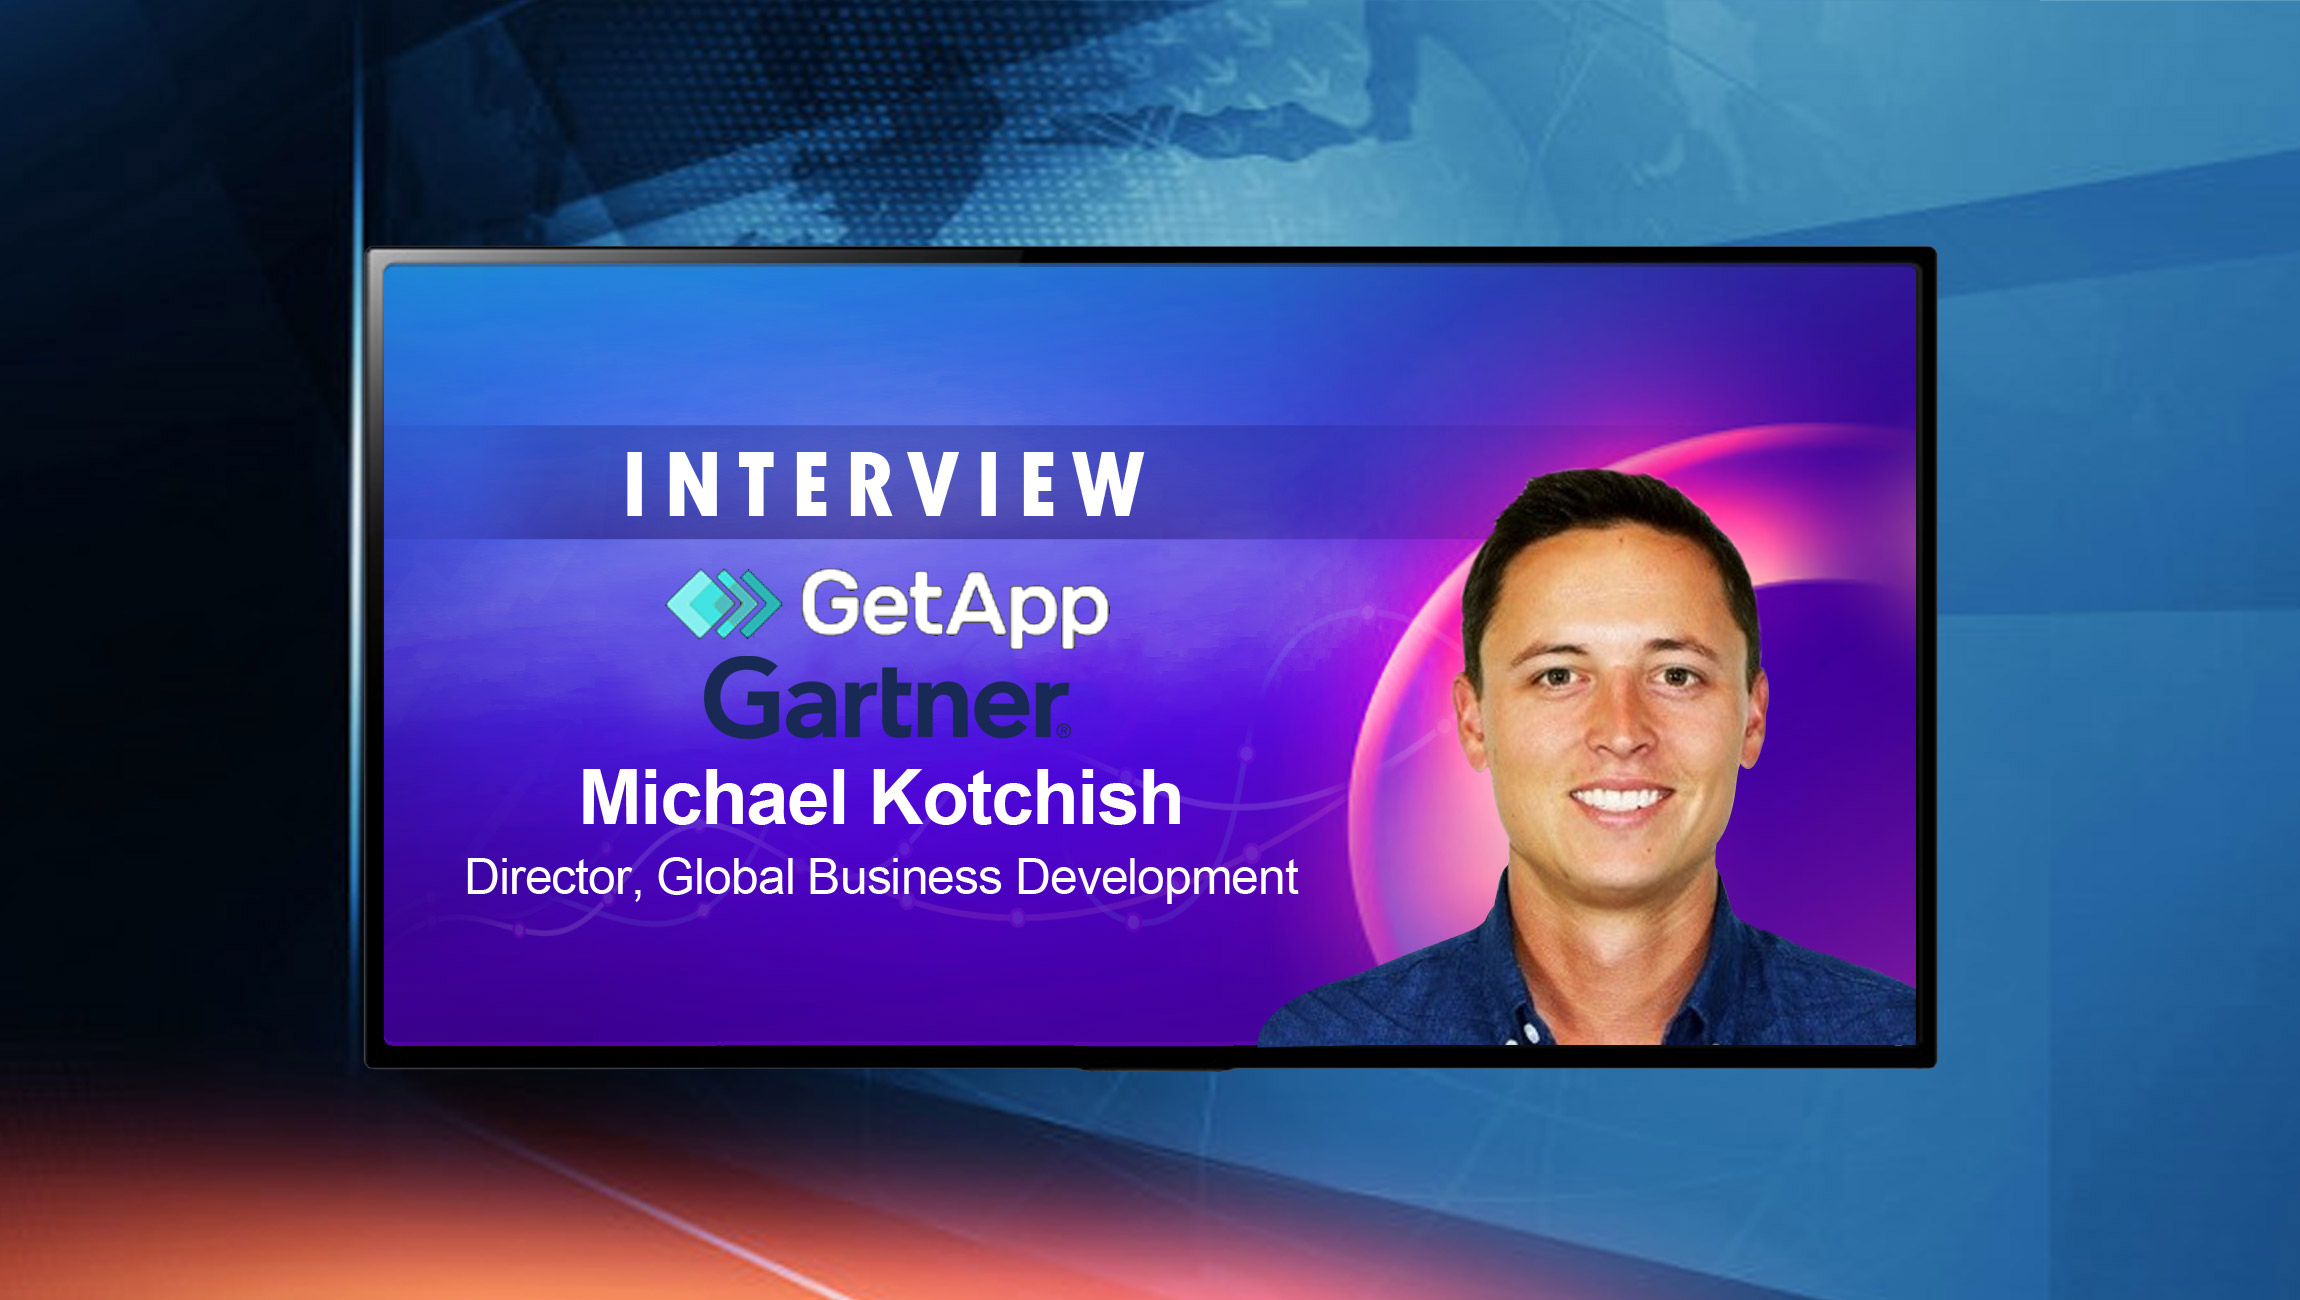 SalesTechStar Interview with Michael Kotchish Director, Global Business Development, for GetApp / Digital Markets at Gartner